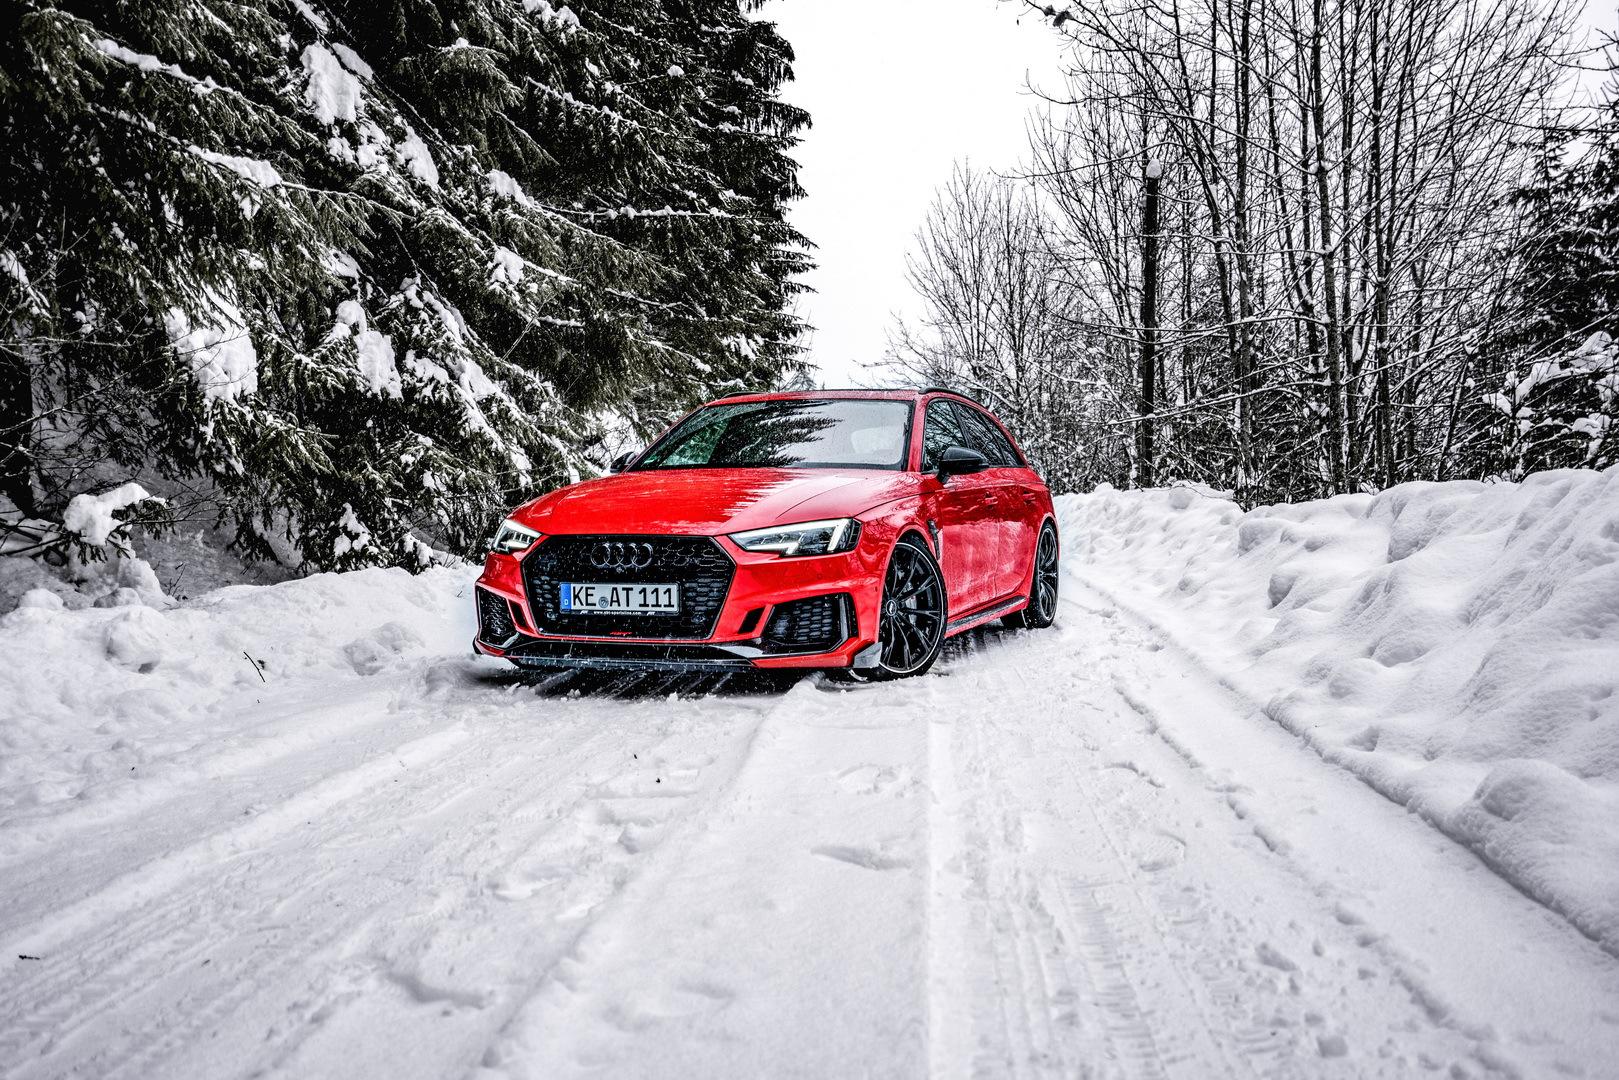 ABT调教奥迪RS4 Sportline提供动力和外观升级套